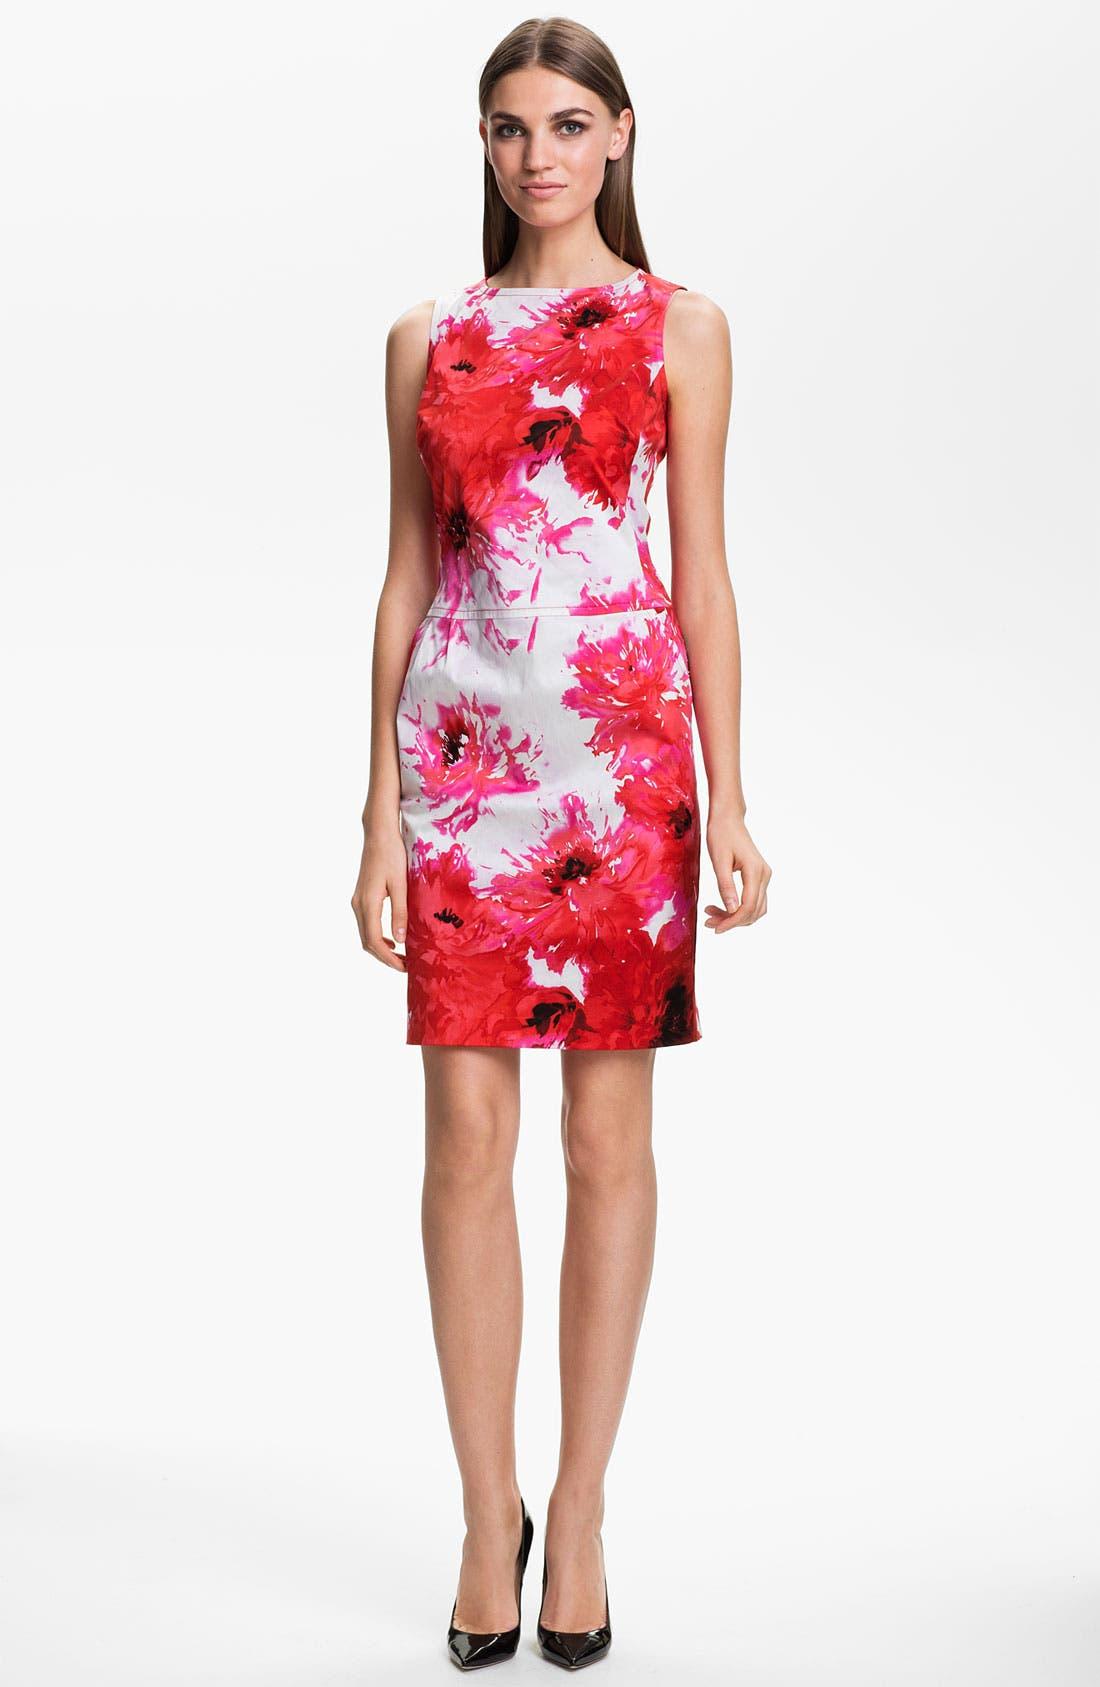 Main Image - St. John Collection Chrysanthemum Print Stretch Sateen Dress